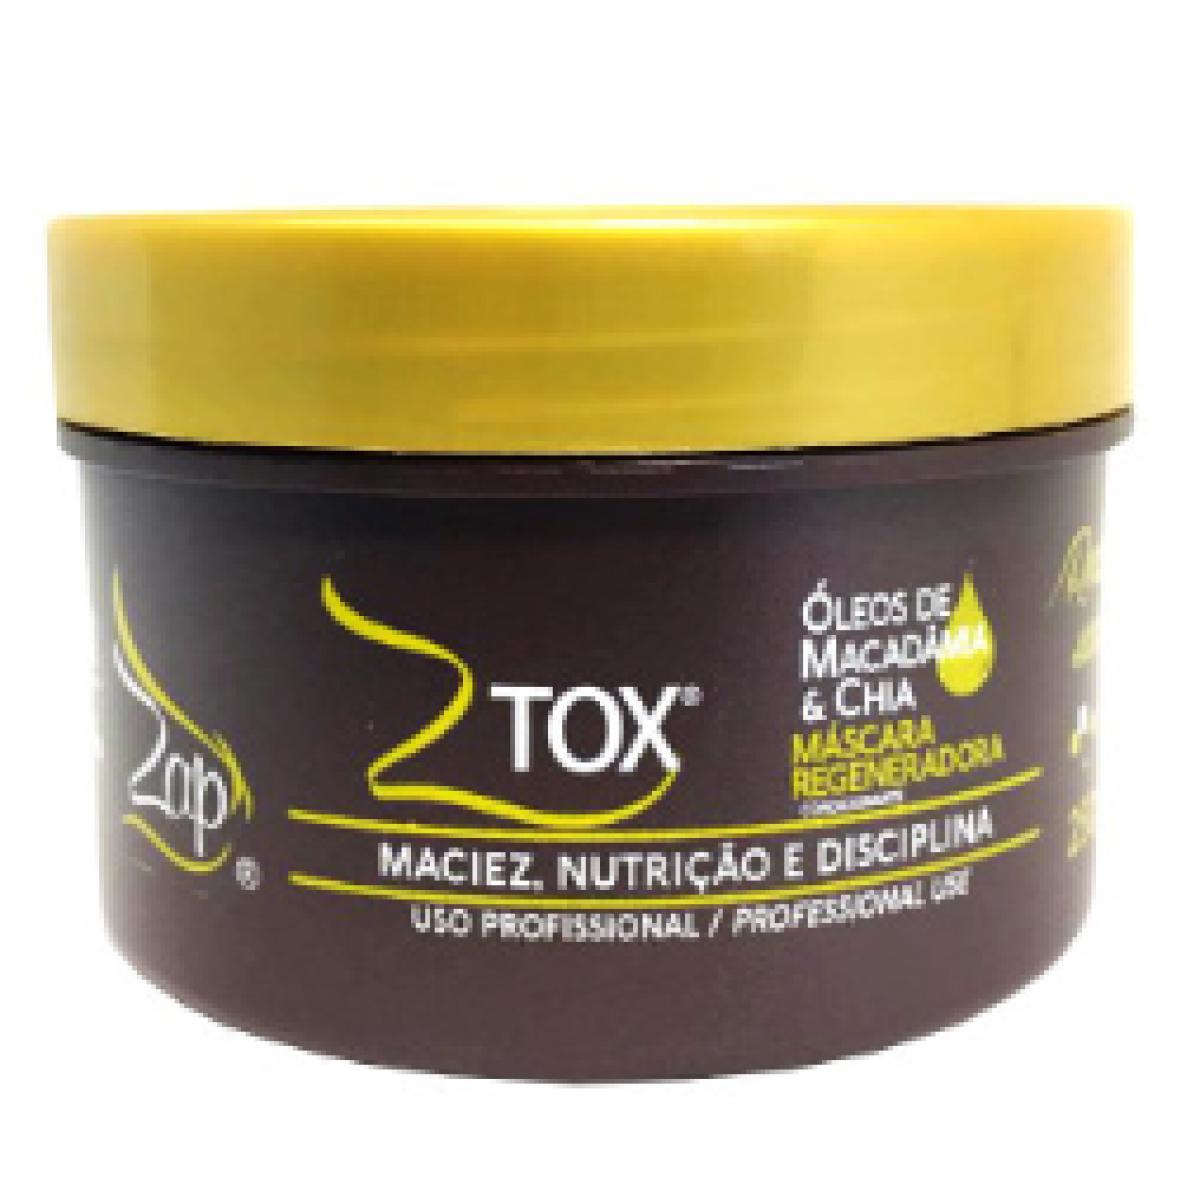 Zap Ztox Btoxx Professional 400g - Nova Embalagem